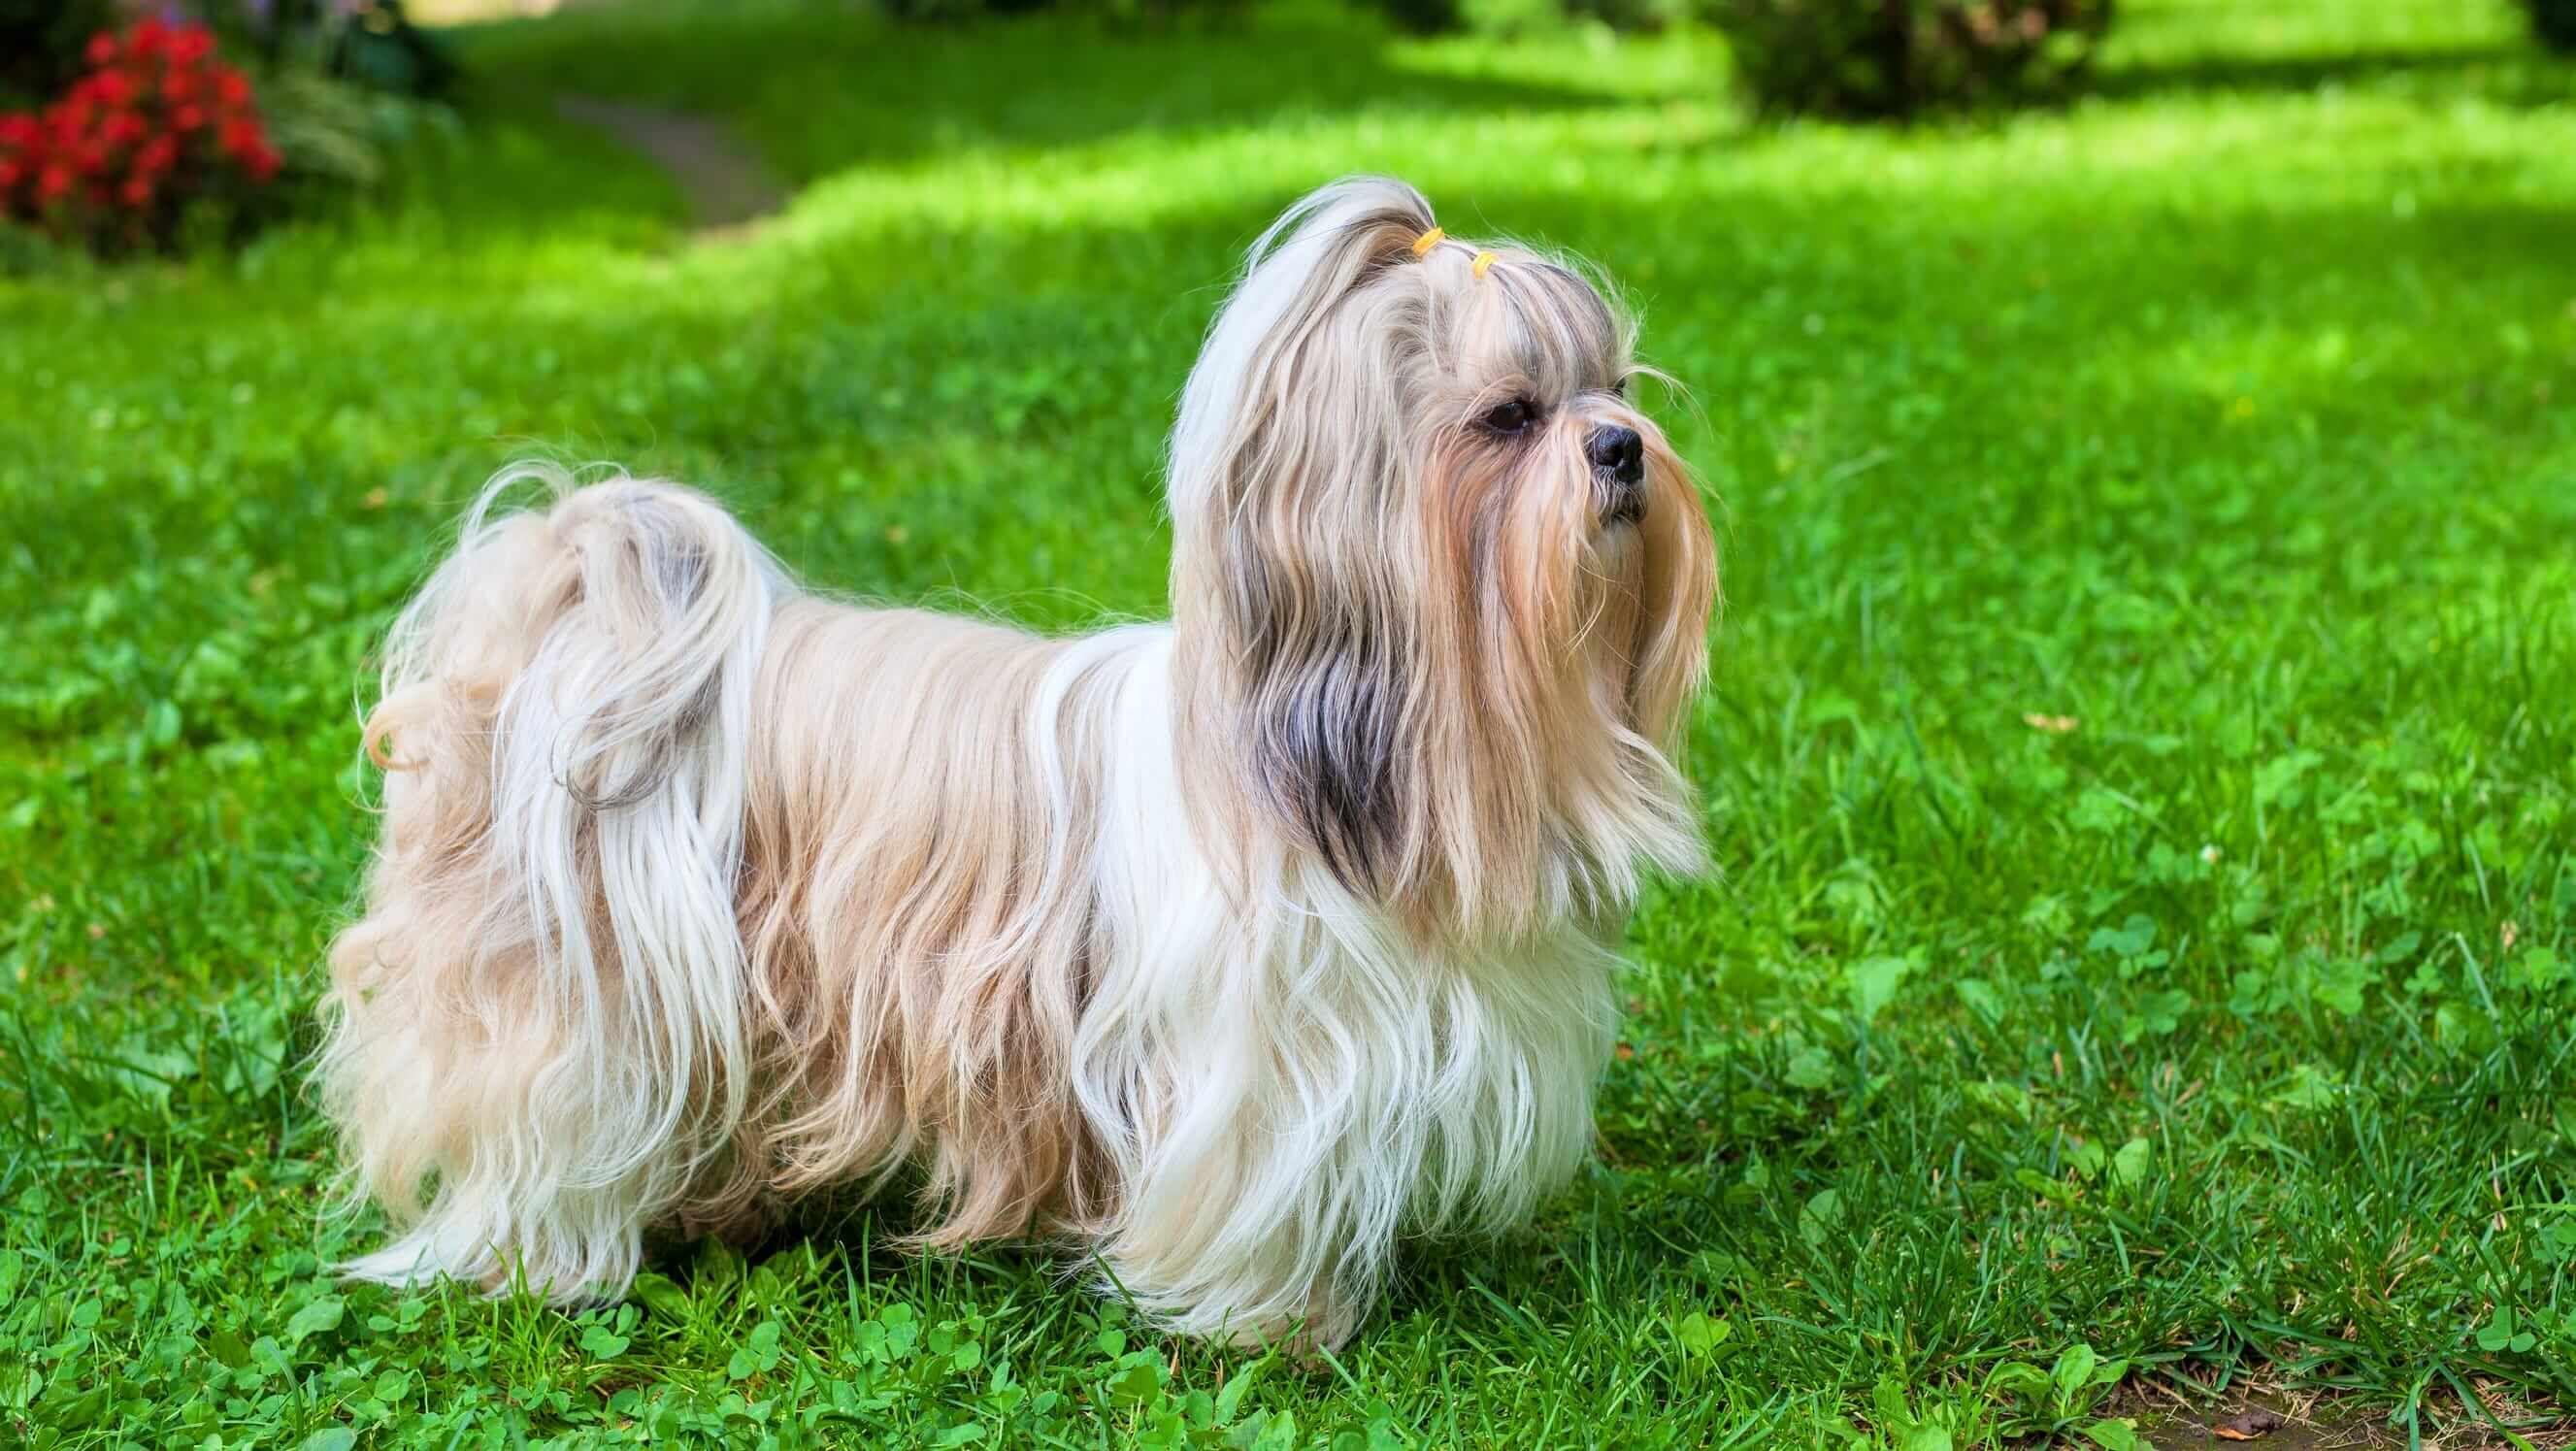 Some Popular And Badass Female Dog Names Dog Names Female Dog Names Top Dog Breeds